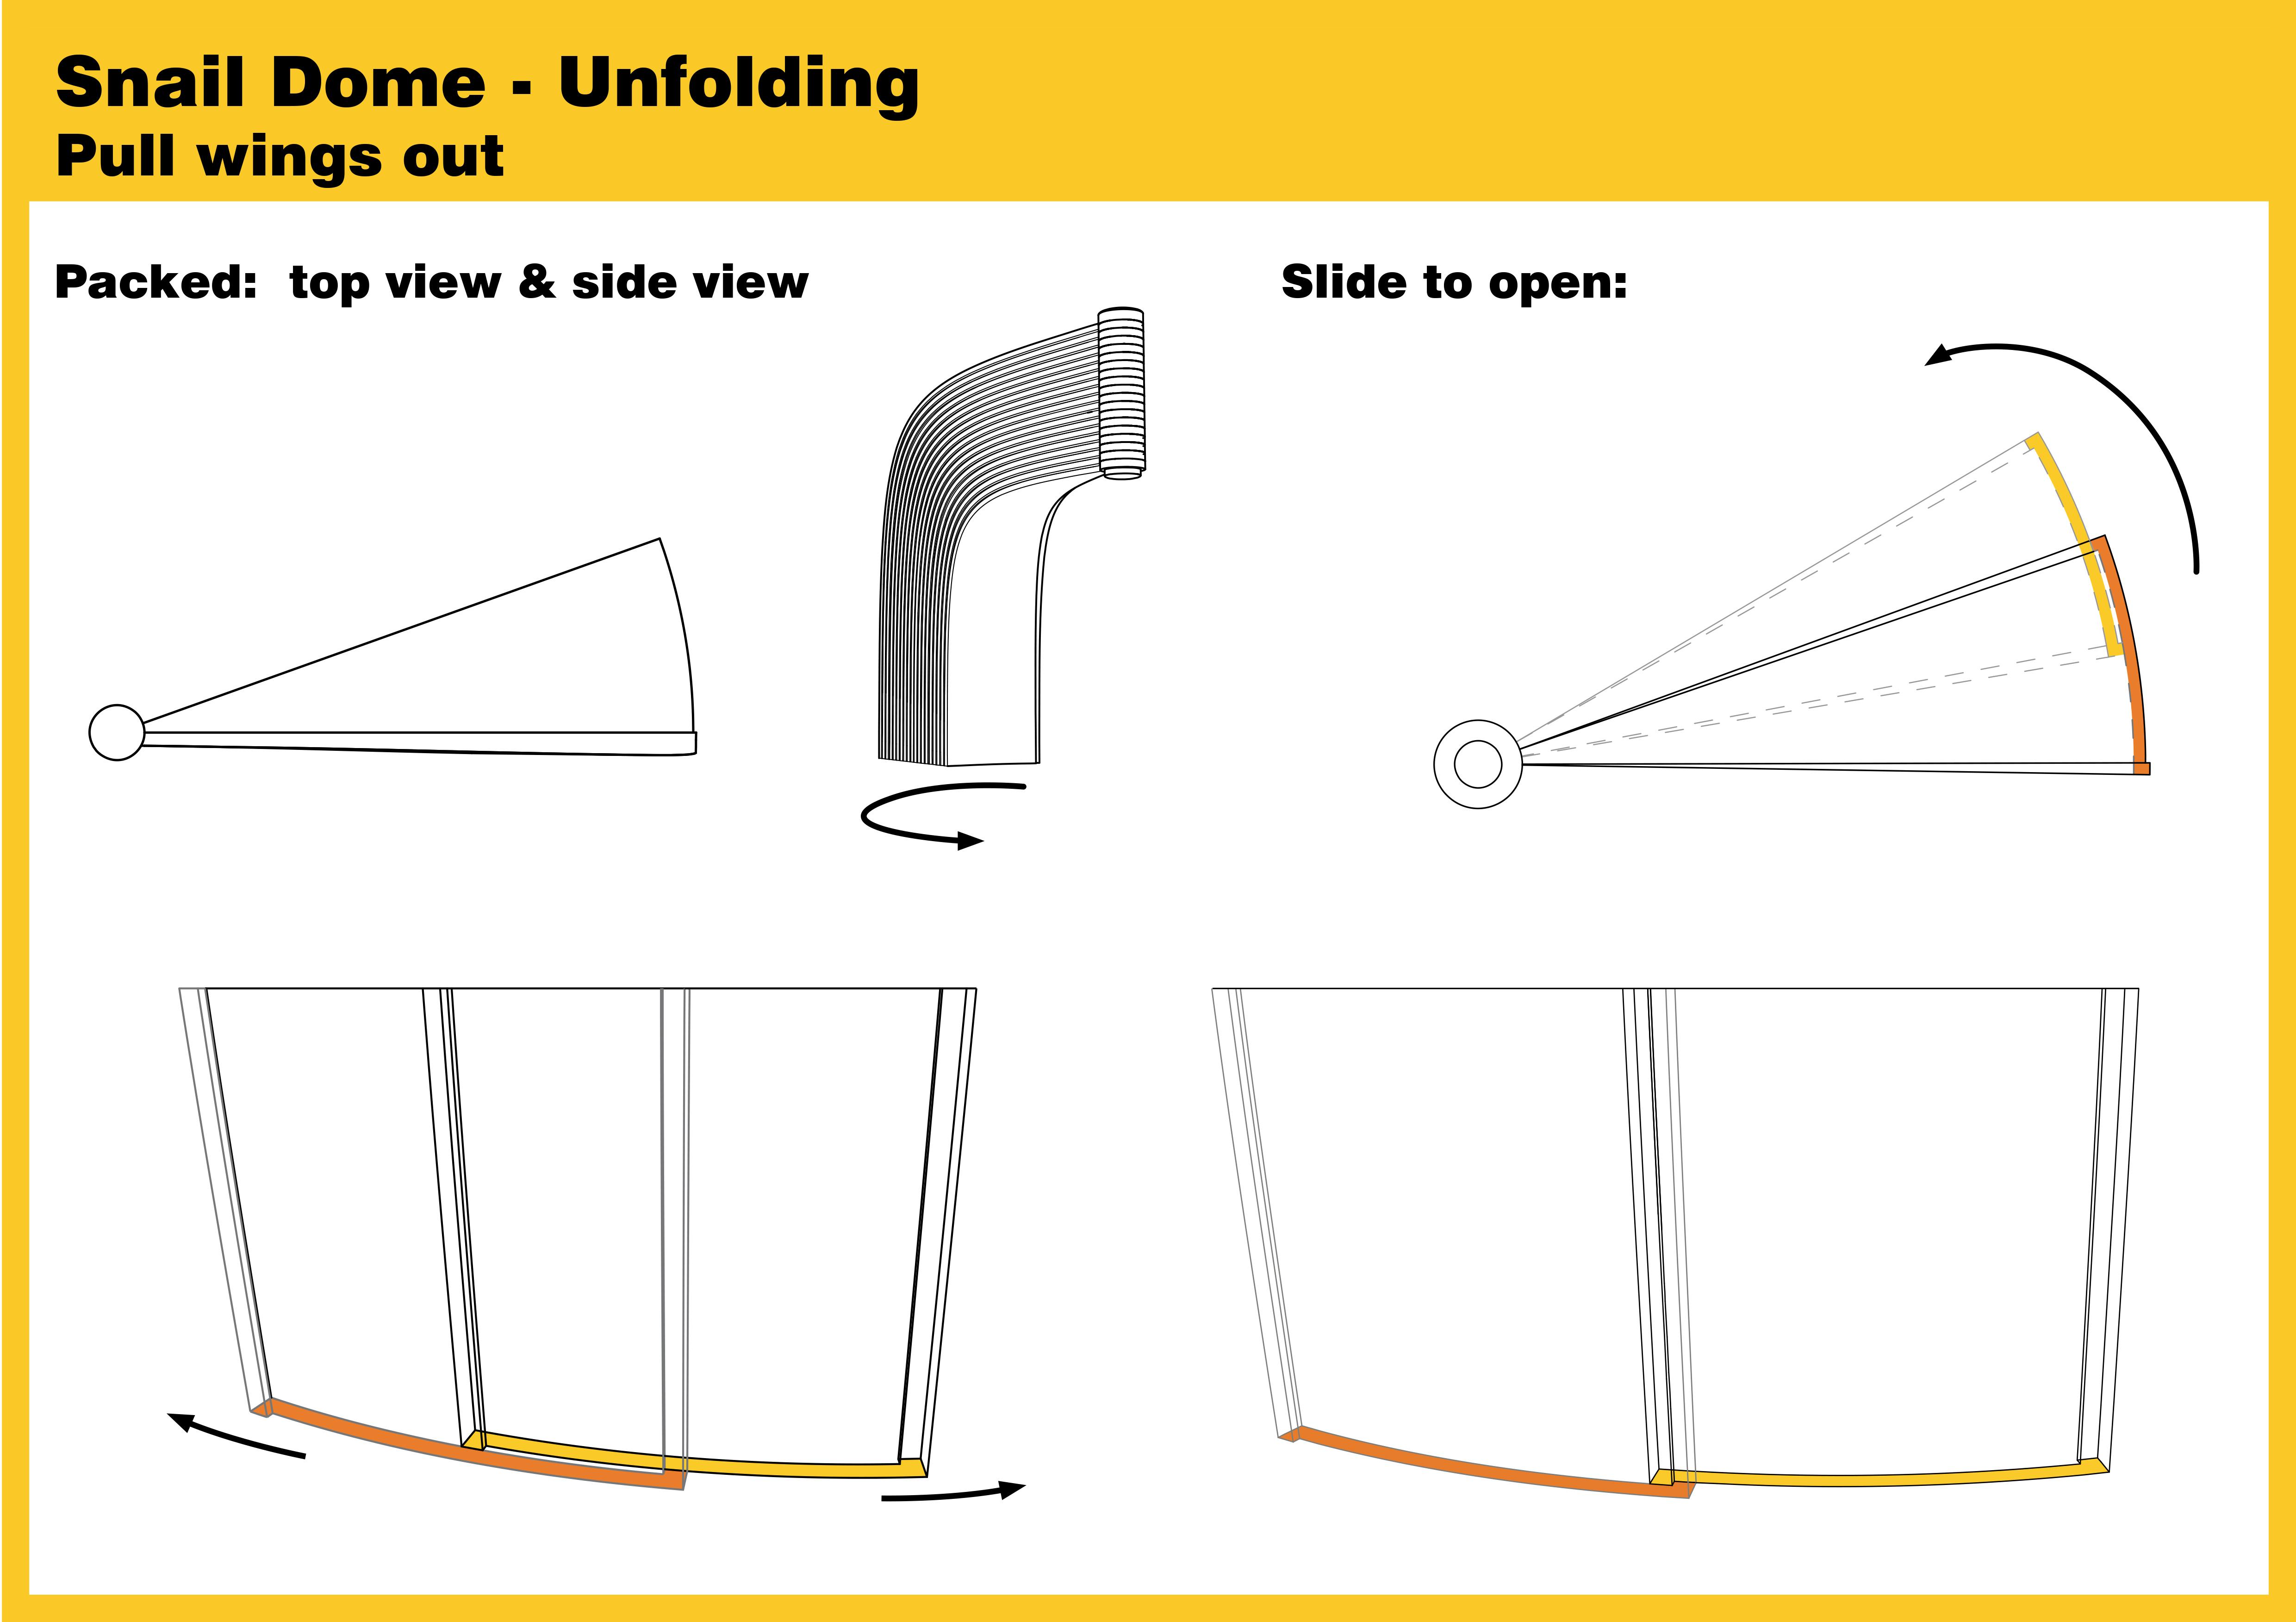 Folding details